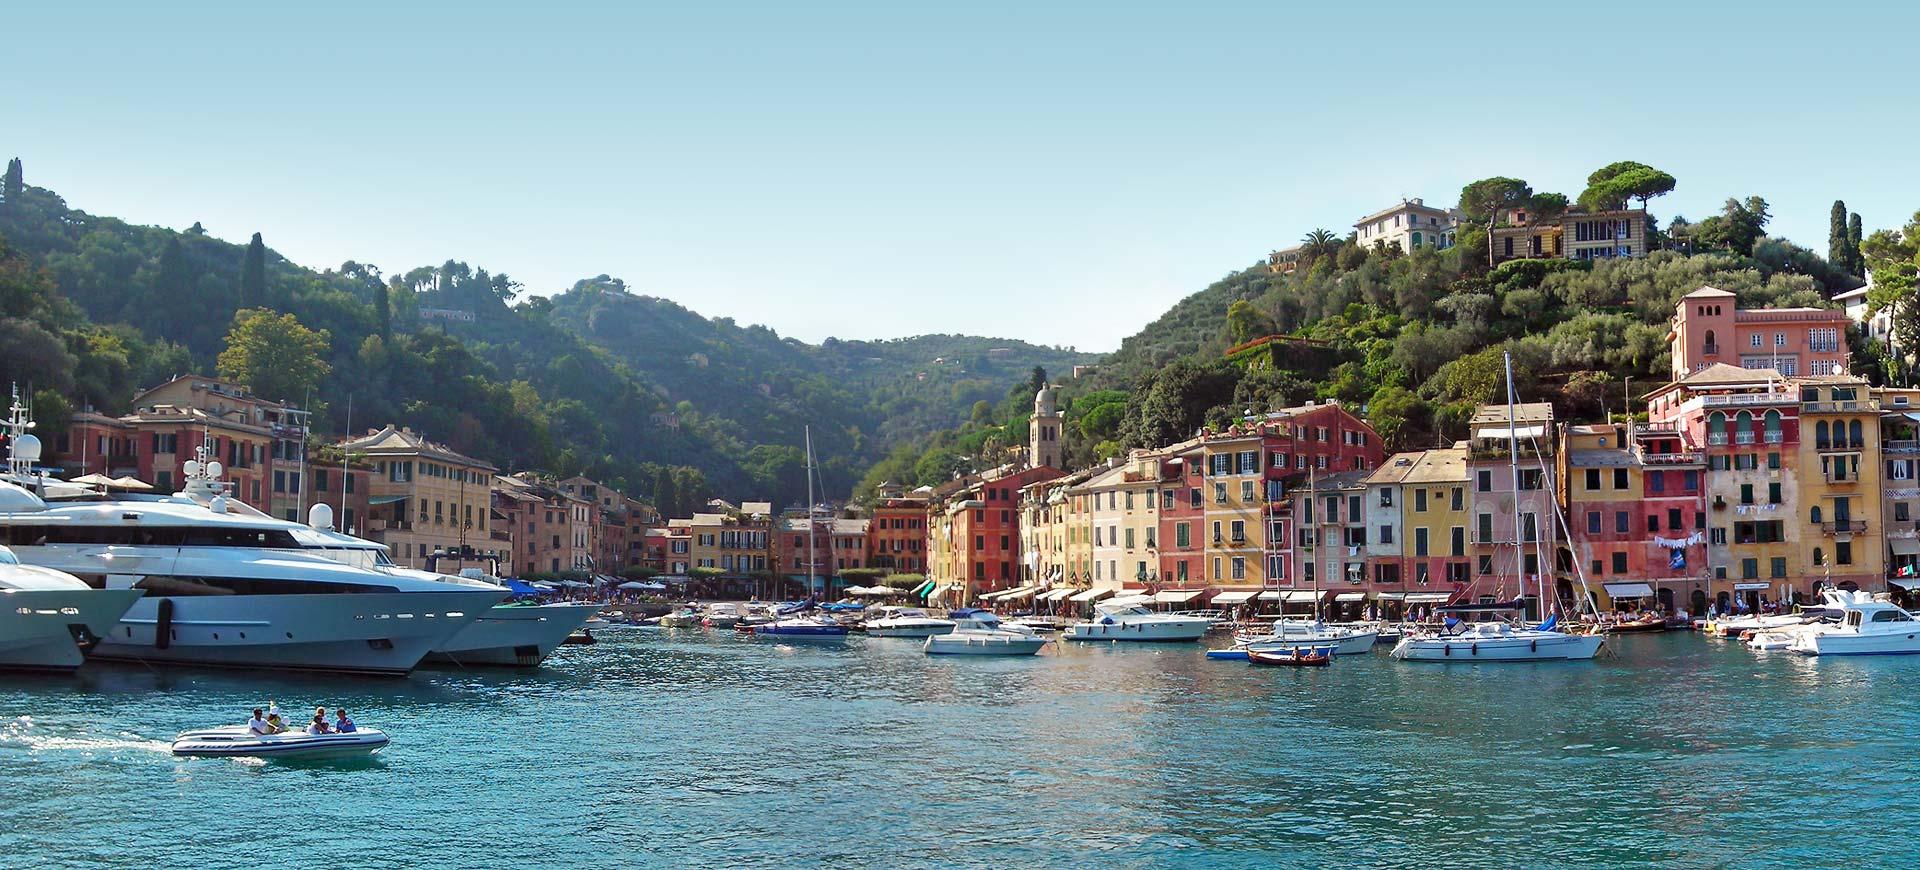 Portofino et Golfo del Tigullio